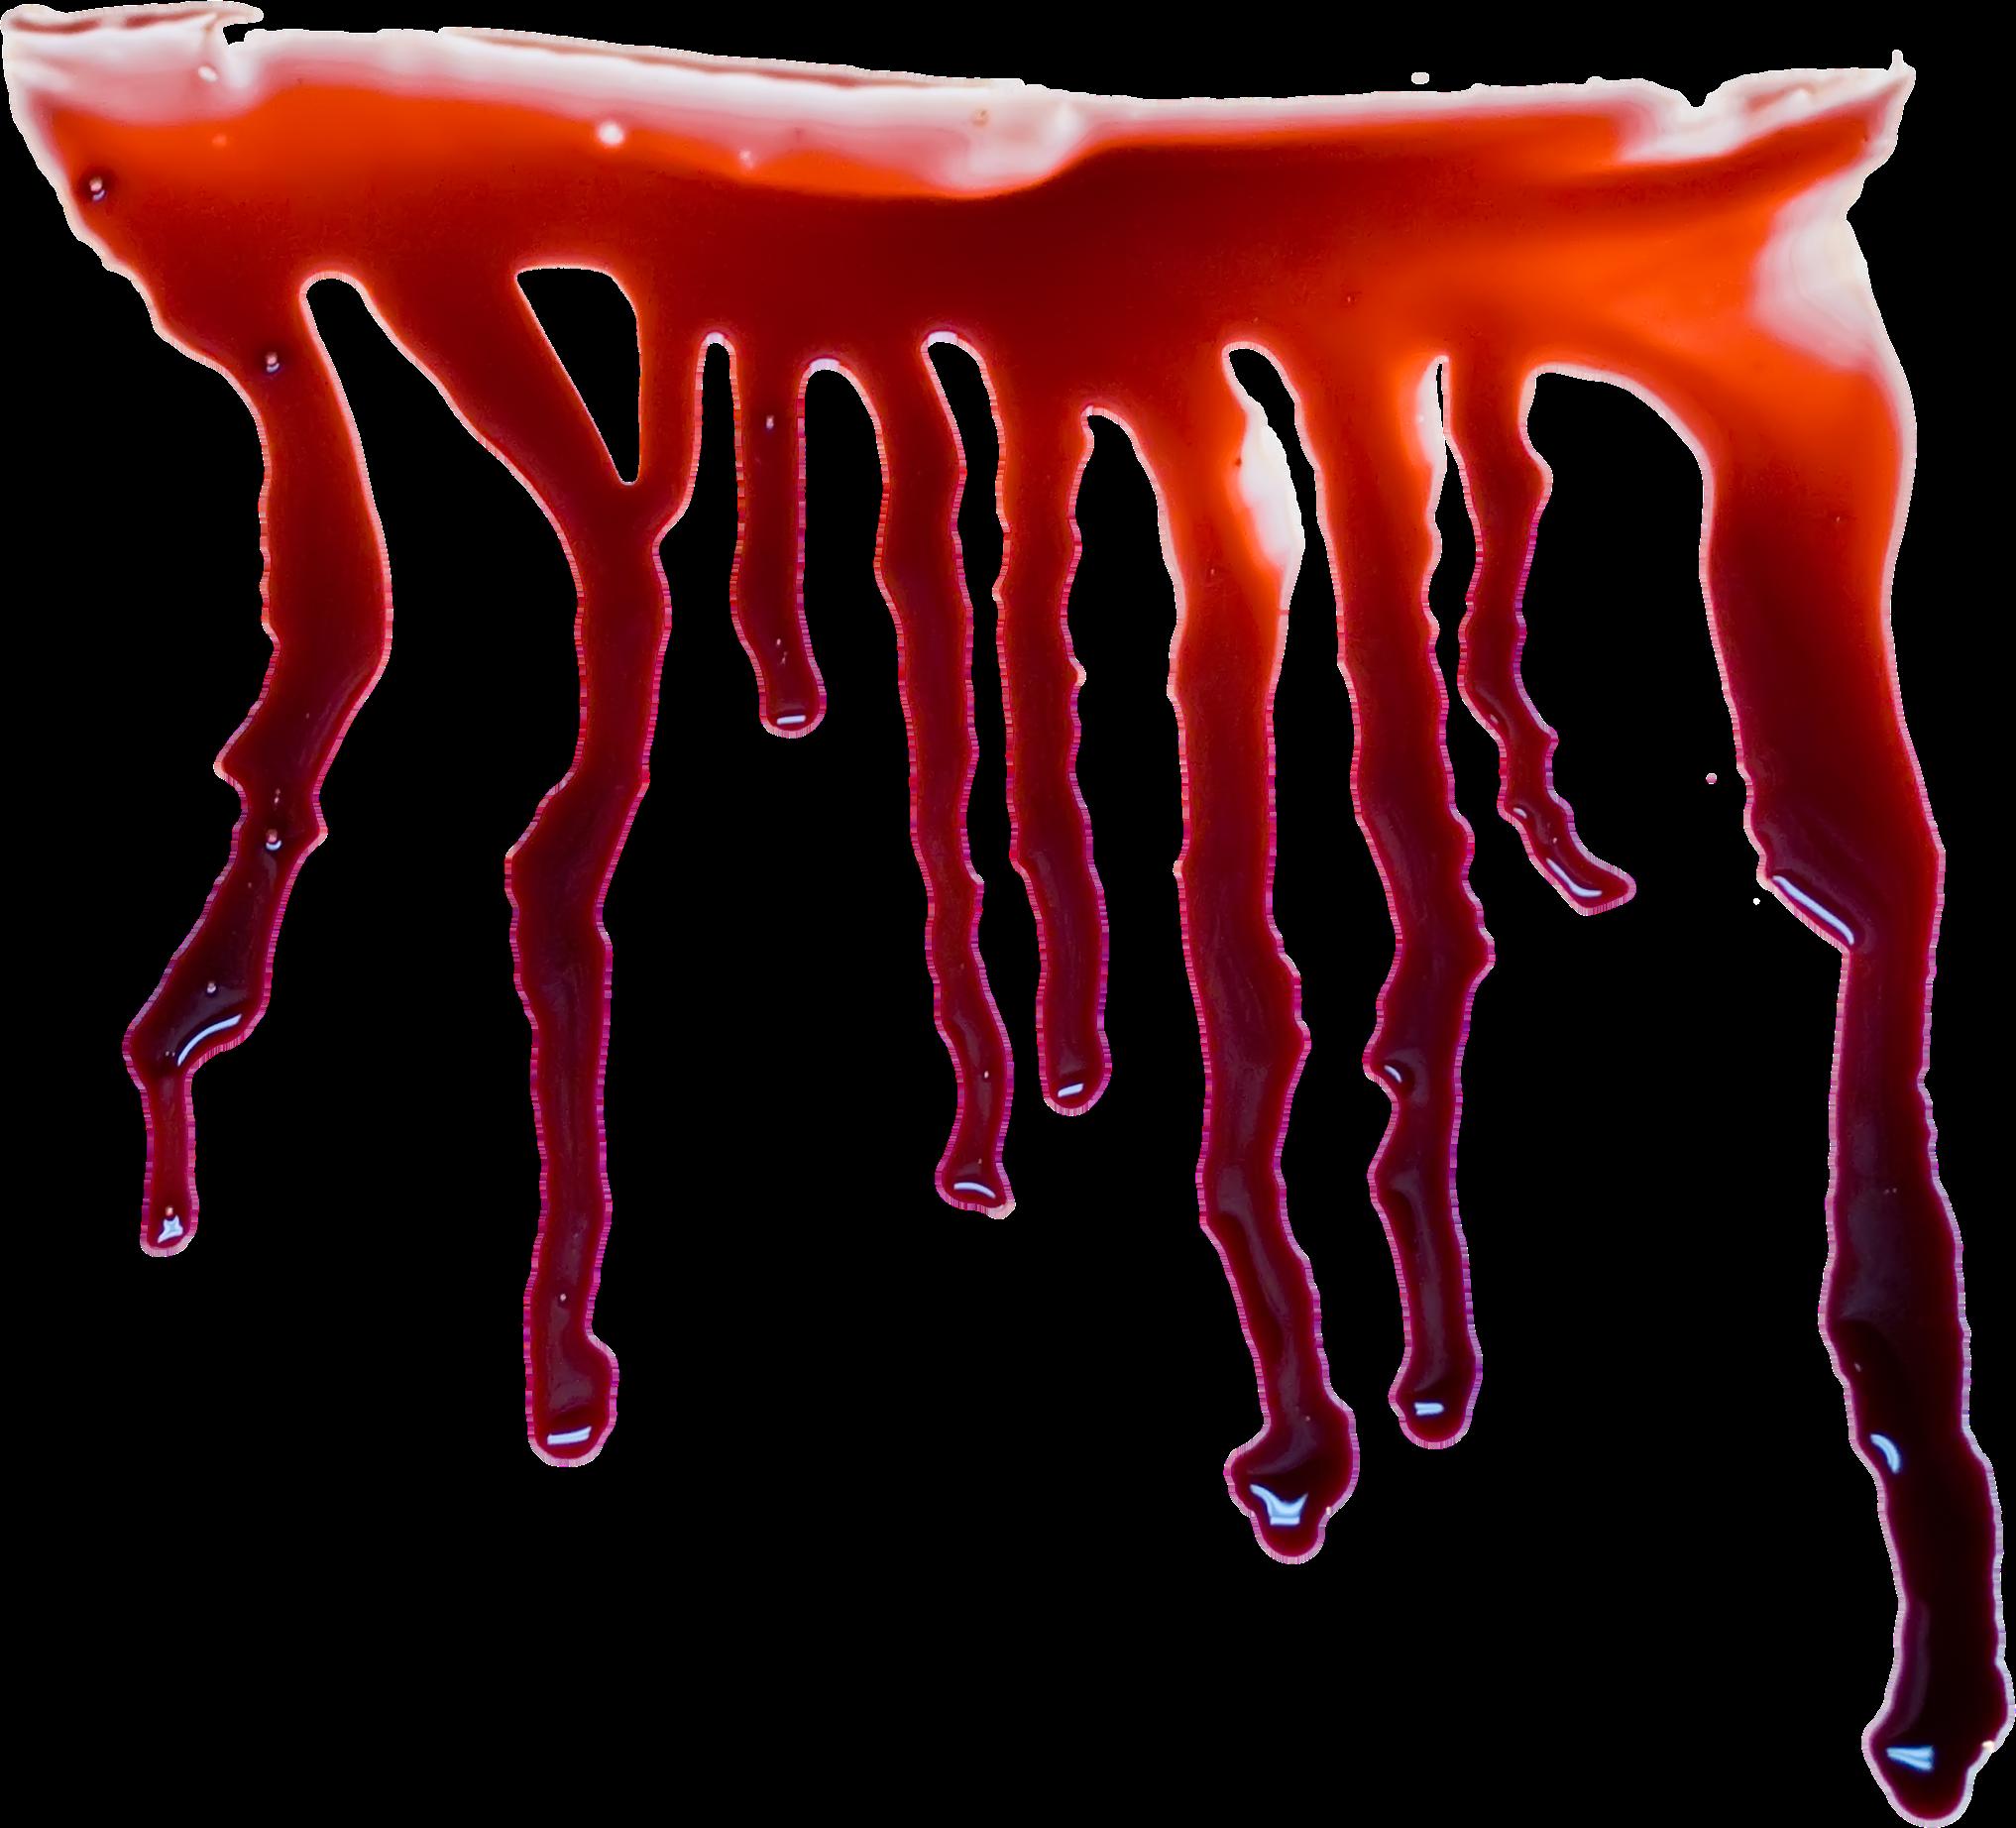 Blood tears png. Images free download splashes